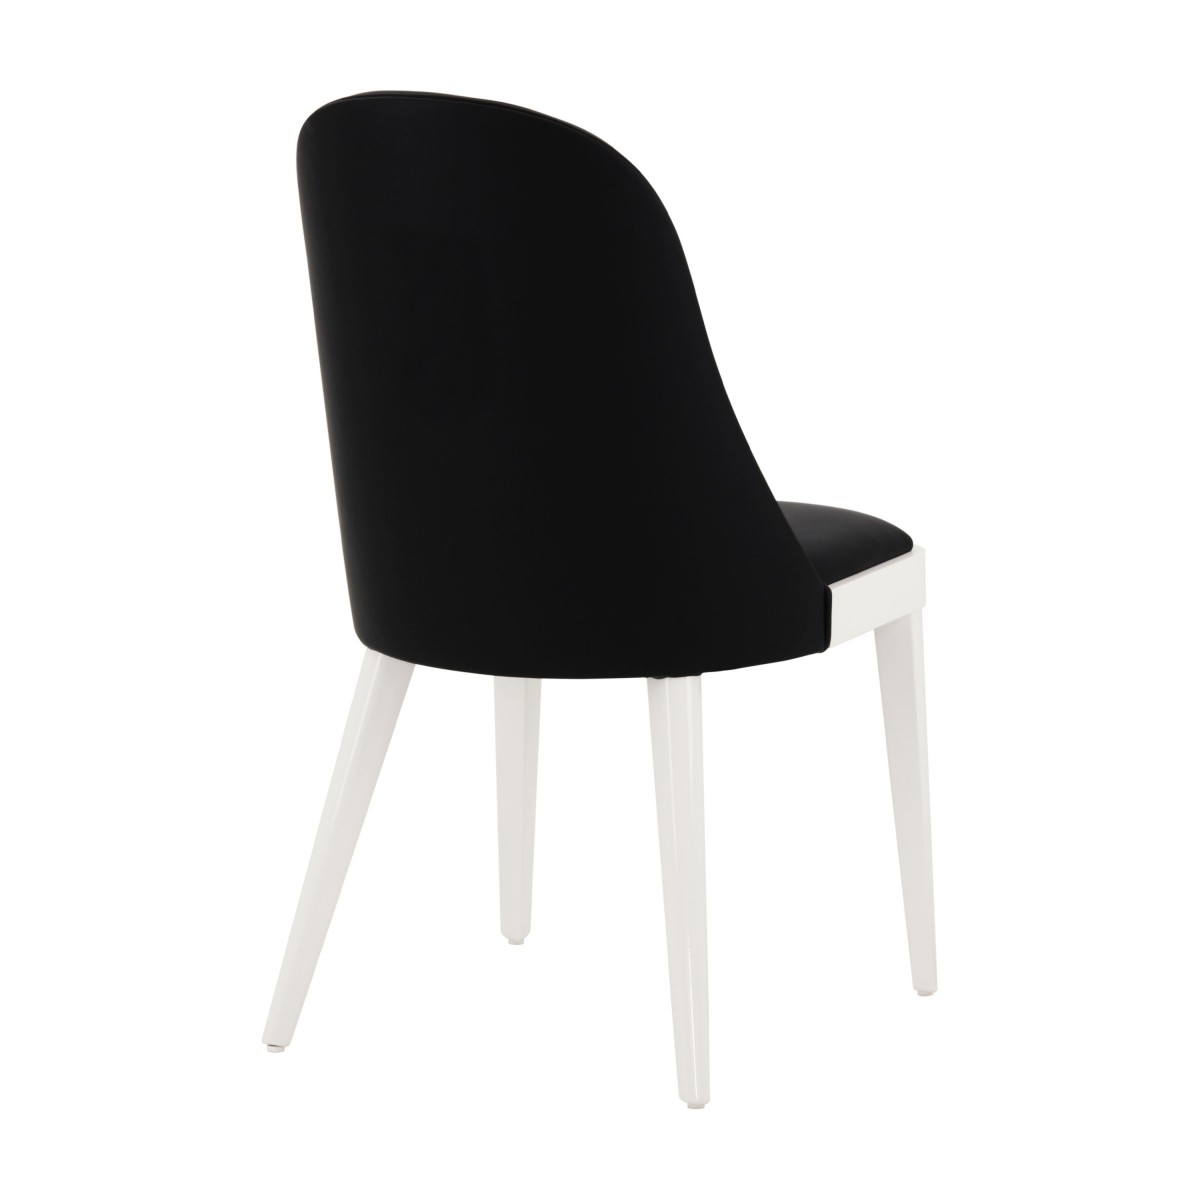 italian modern chair svezia 1 7734